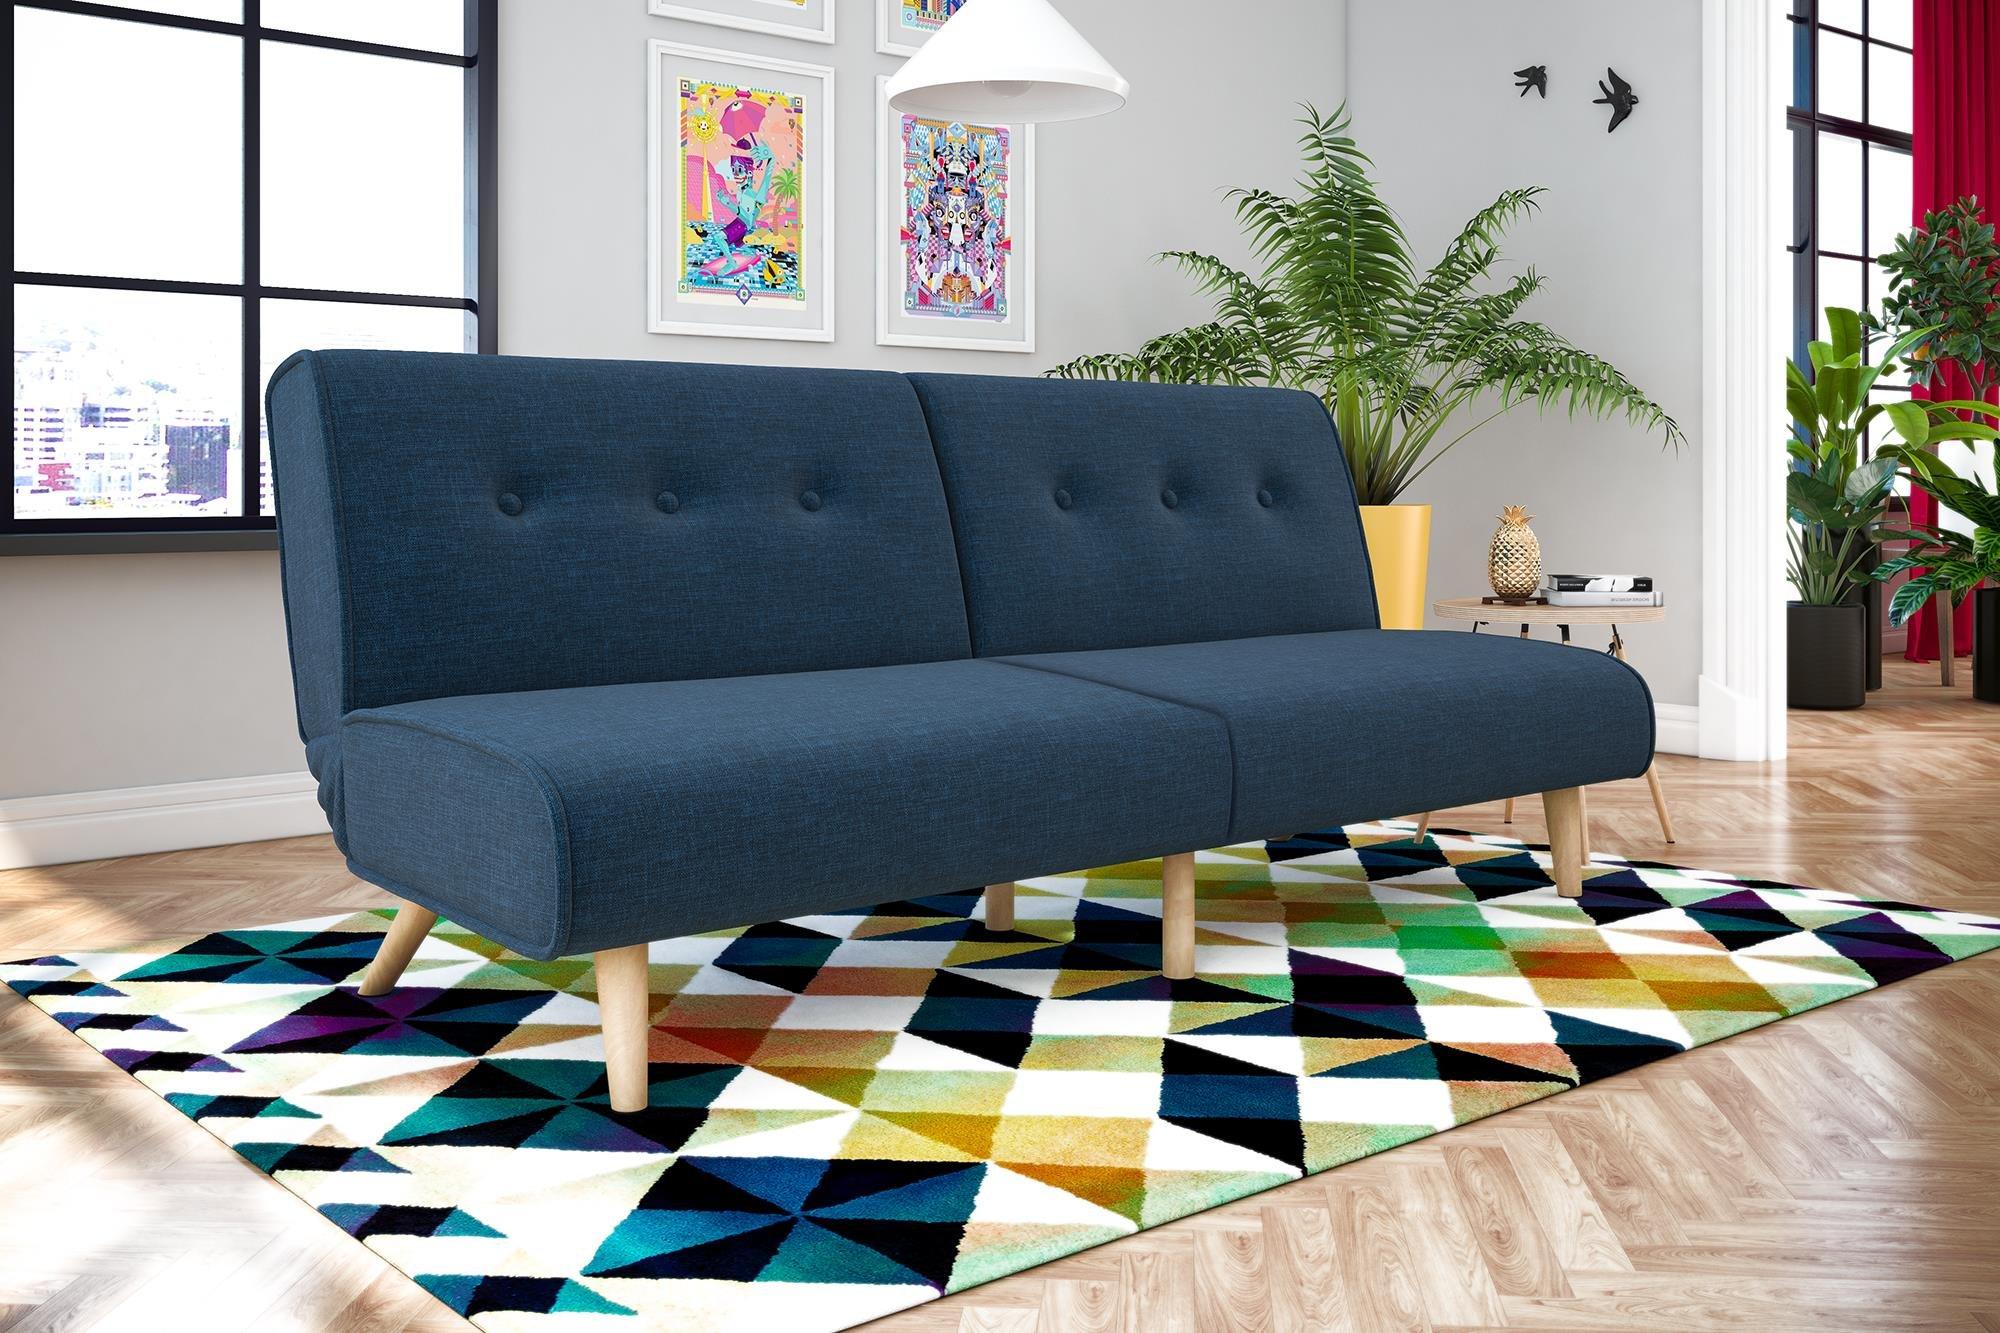 Novogratz Palm Springs Convertible Sofa Sleeper in Rich Linen, Sturdy Wooden Legs and Tufted Design, Blue Linen by Novogratz